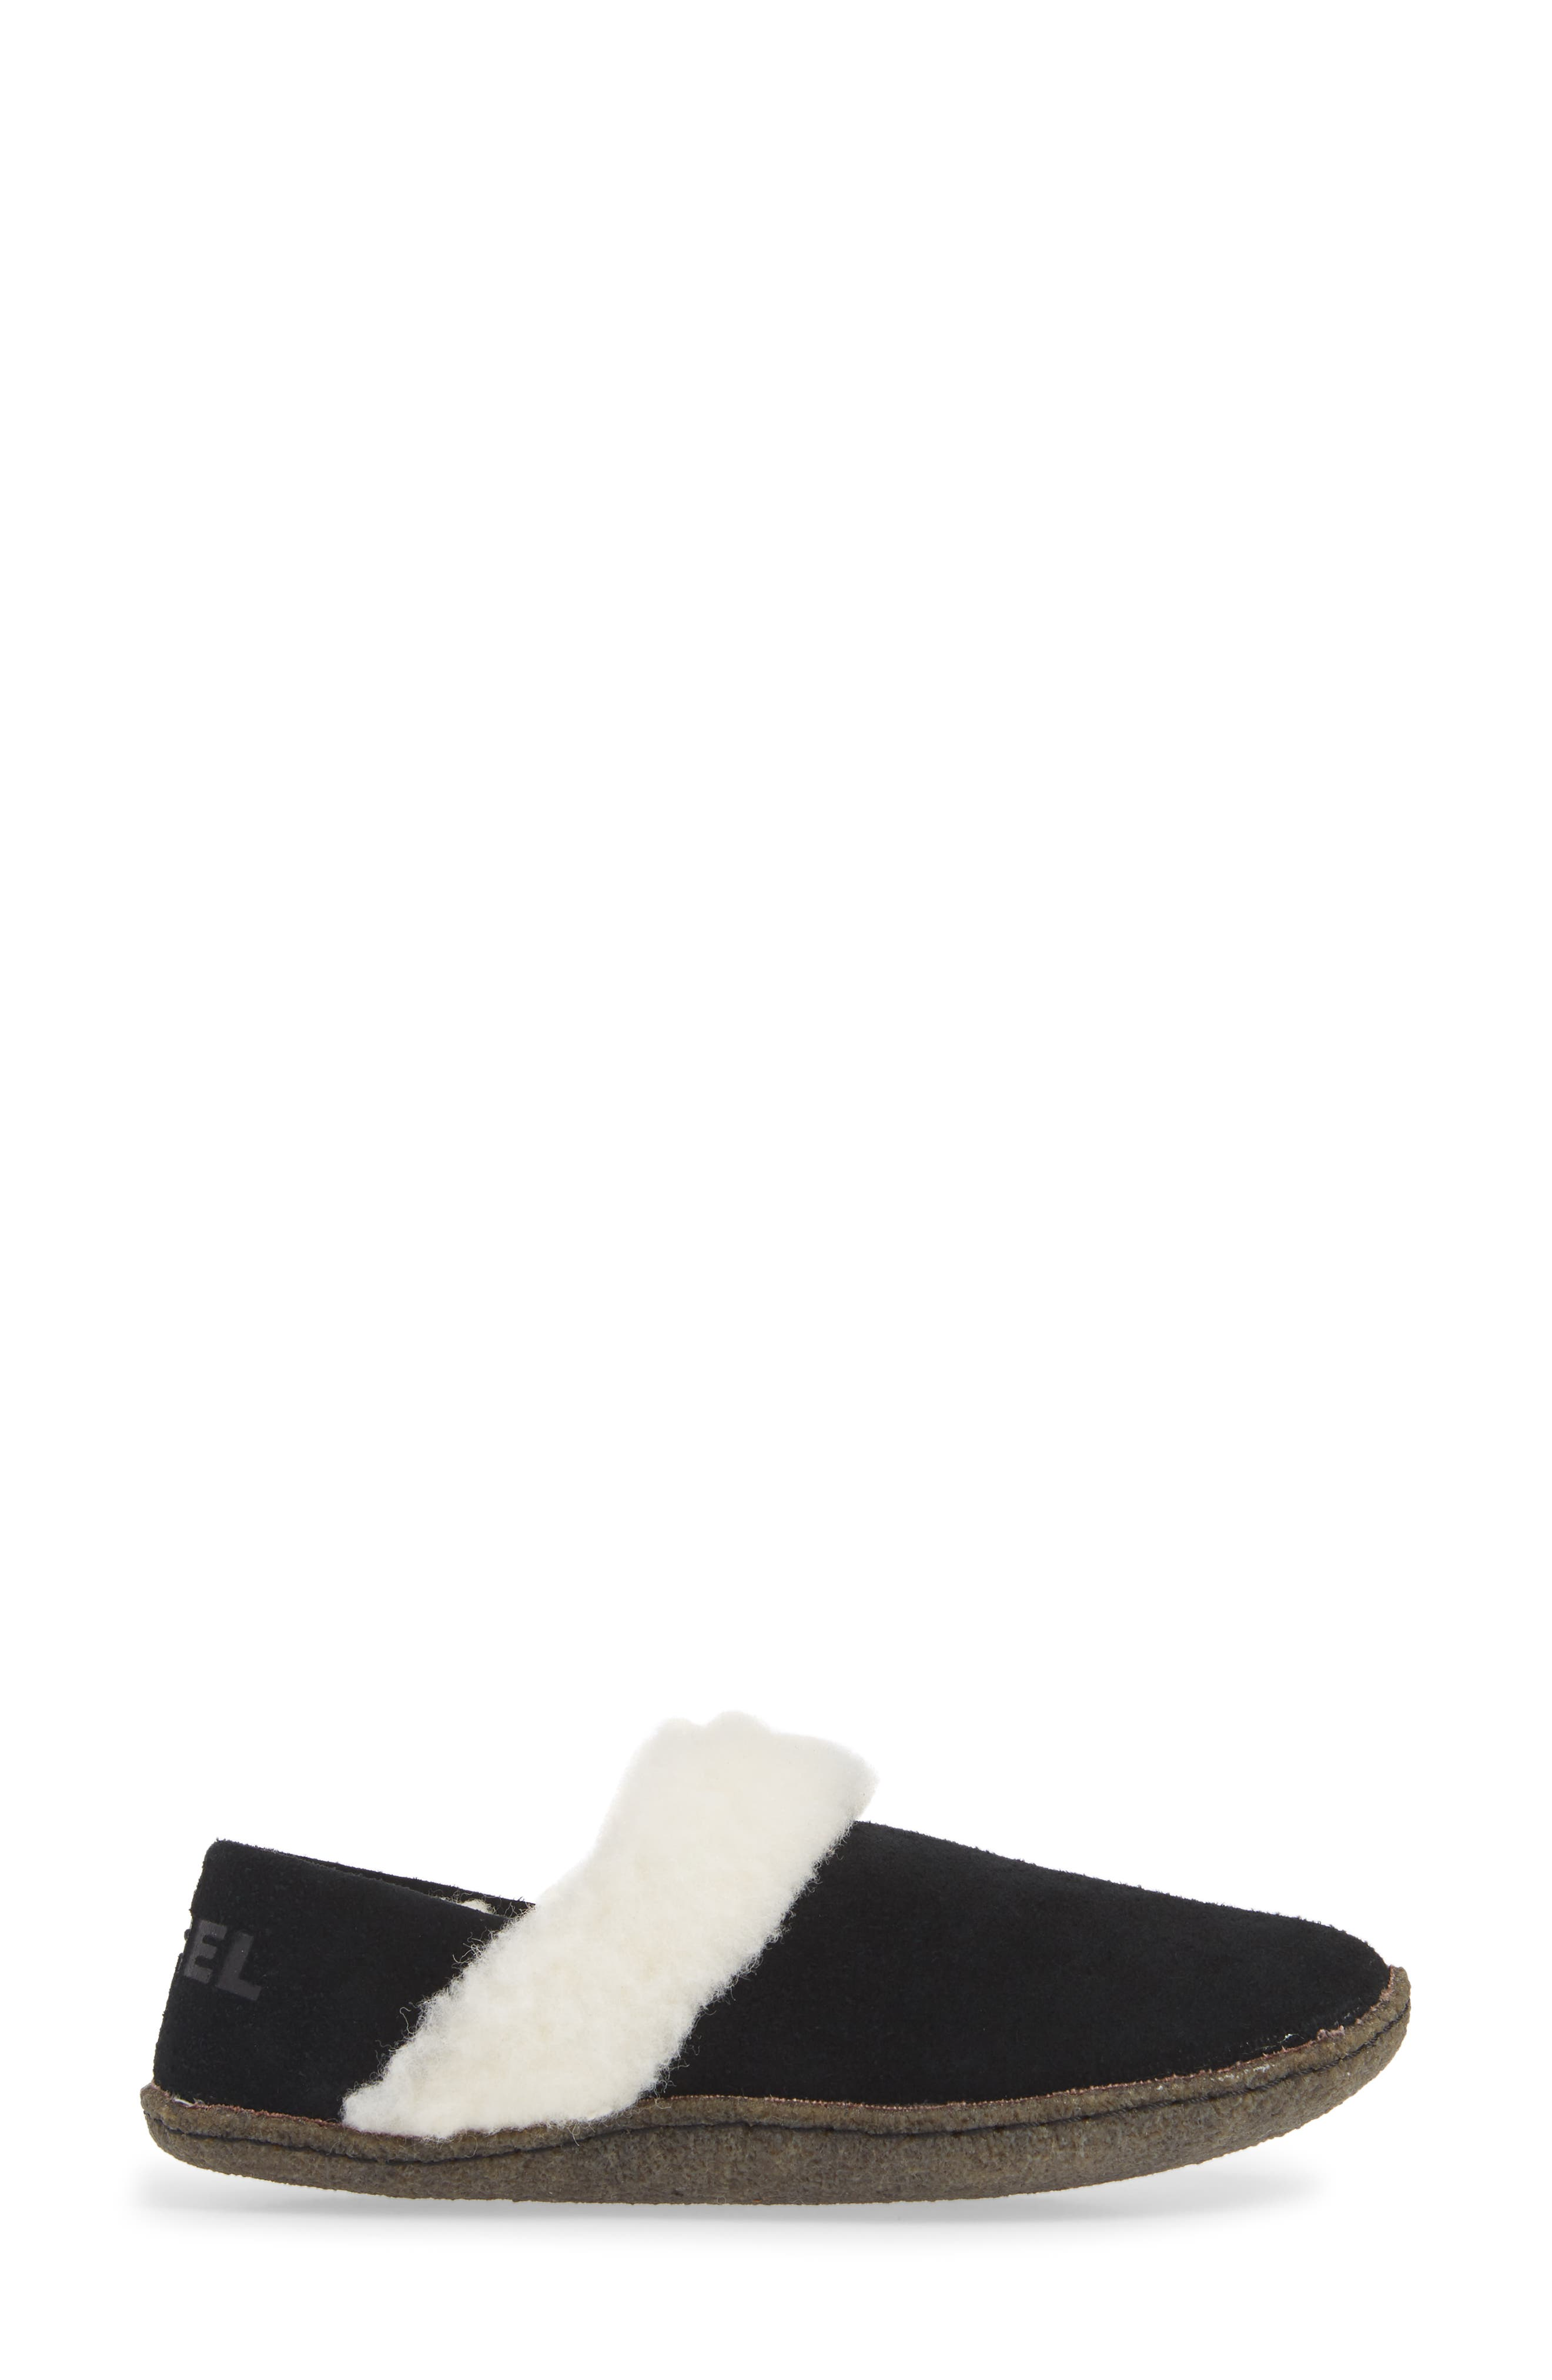 Nakiska II Faux Shearling Lined Slipper,                             Alternate thumbnail 3, color,                             BLACK/ NATURAL